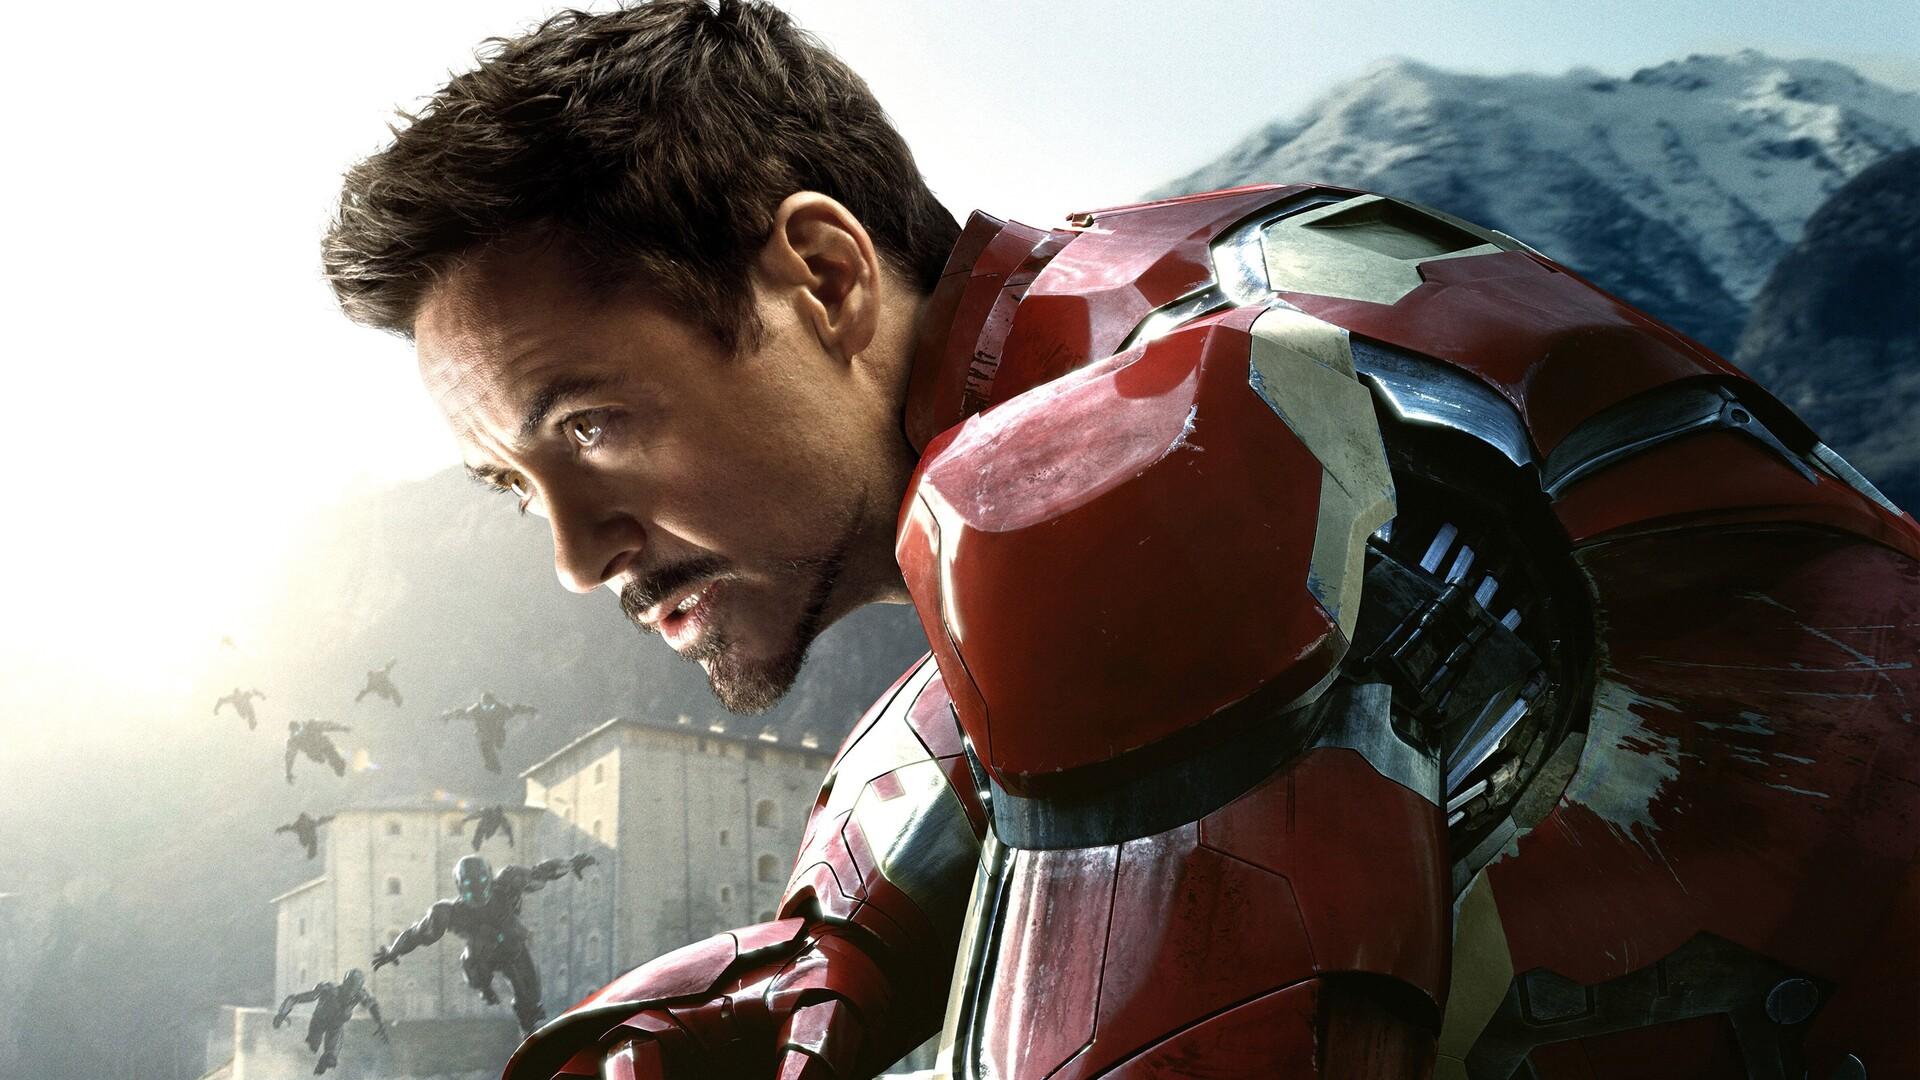 1920x1080 Iron Man Avengers Age Of Ultron Laptop Full Hd 1080p Hd 4k